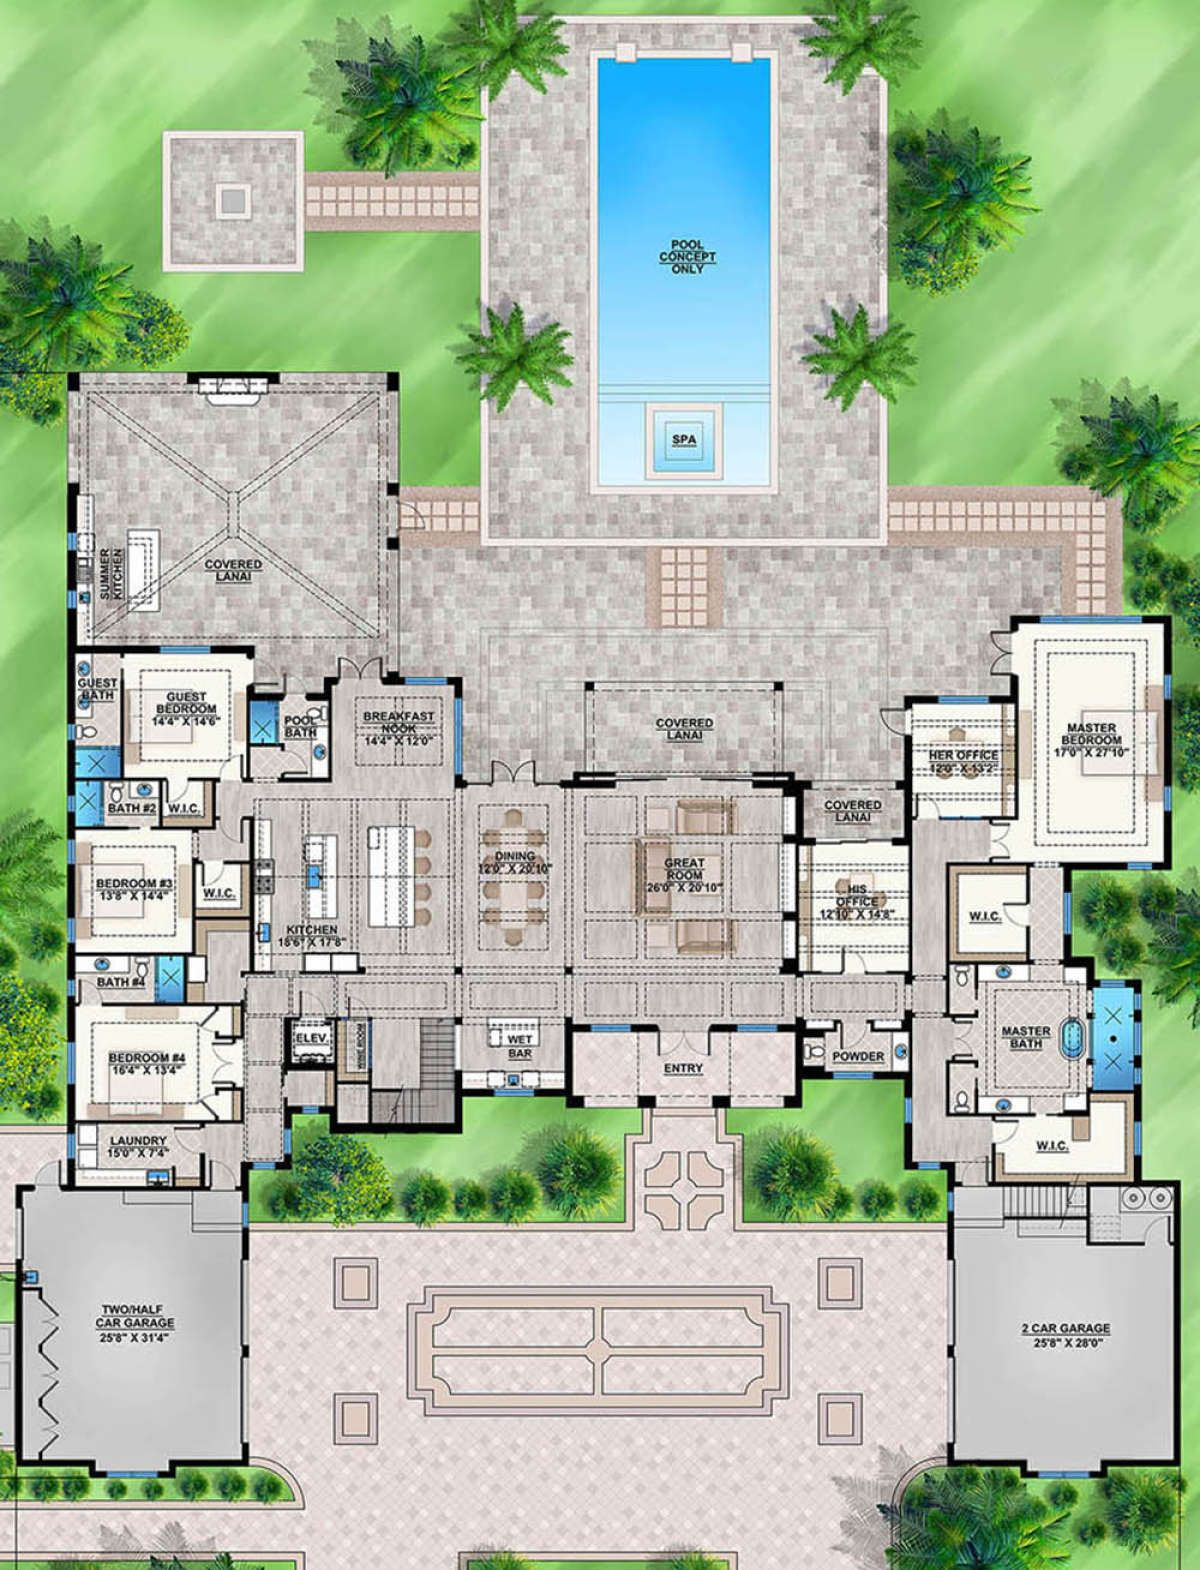 House Plan 5565 00047 Luxury Plan 8 285 Square Feet 7 Bedrooms 8 5 Bathrooms In 2021 Luxury Floor Plans Mansion Floor Plan Luxury Plan